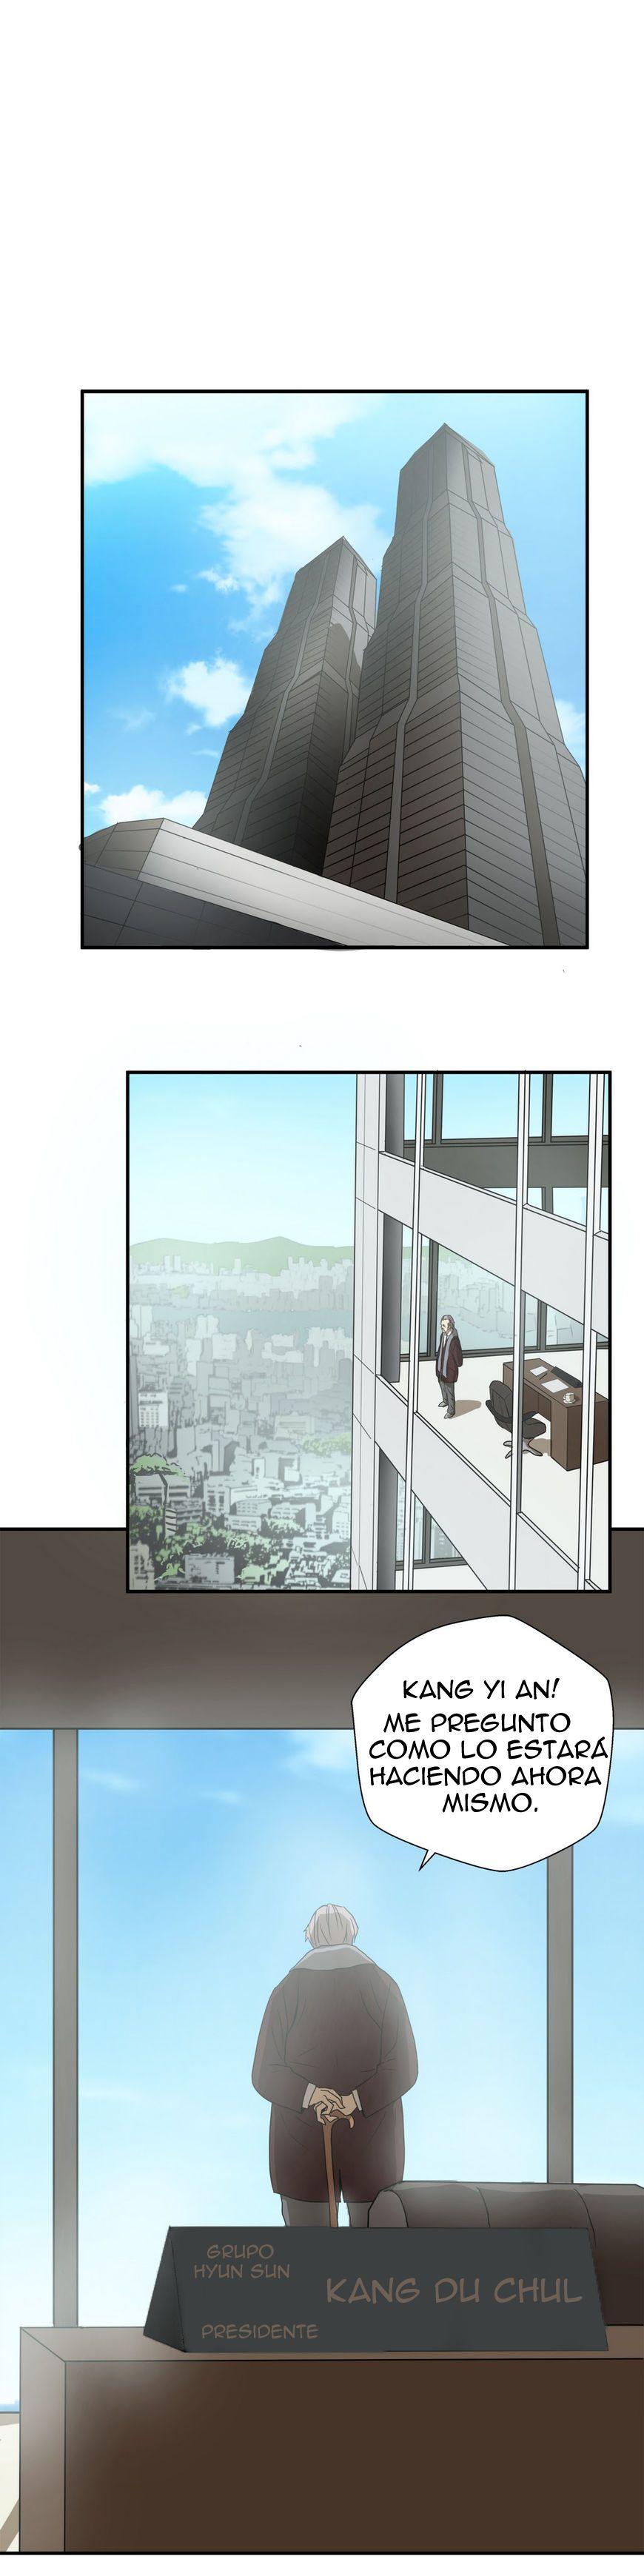 https://c5.ninemanga.com/es_manga/58/19386/461841/b3bf93c3f758b0e8881c3573883adcf9.jpg Page 6